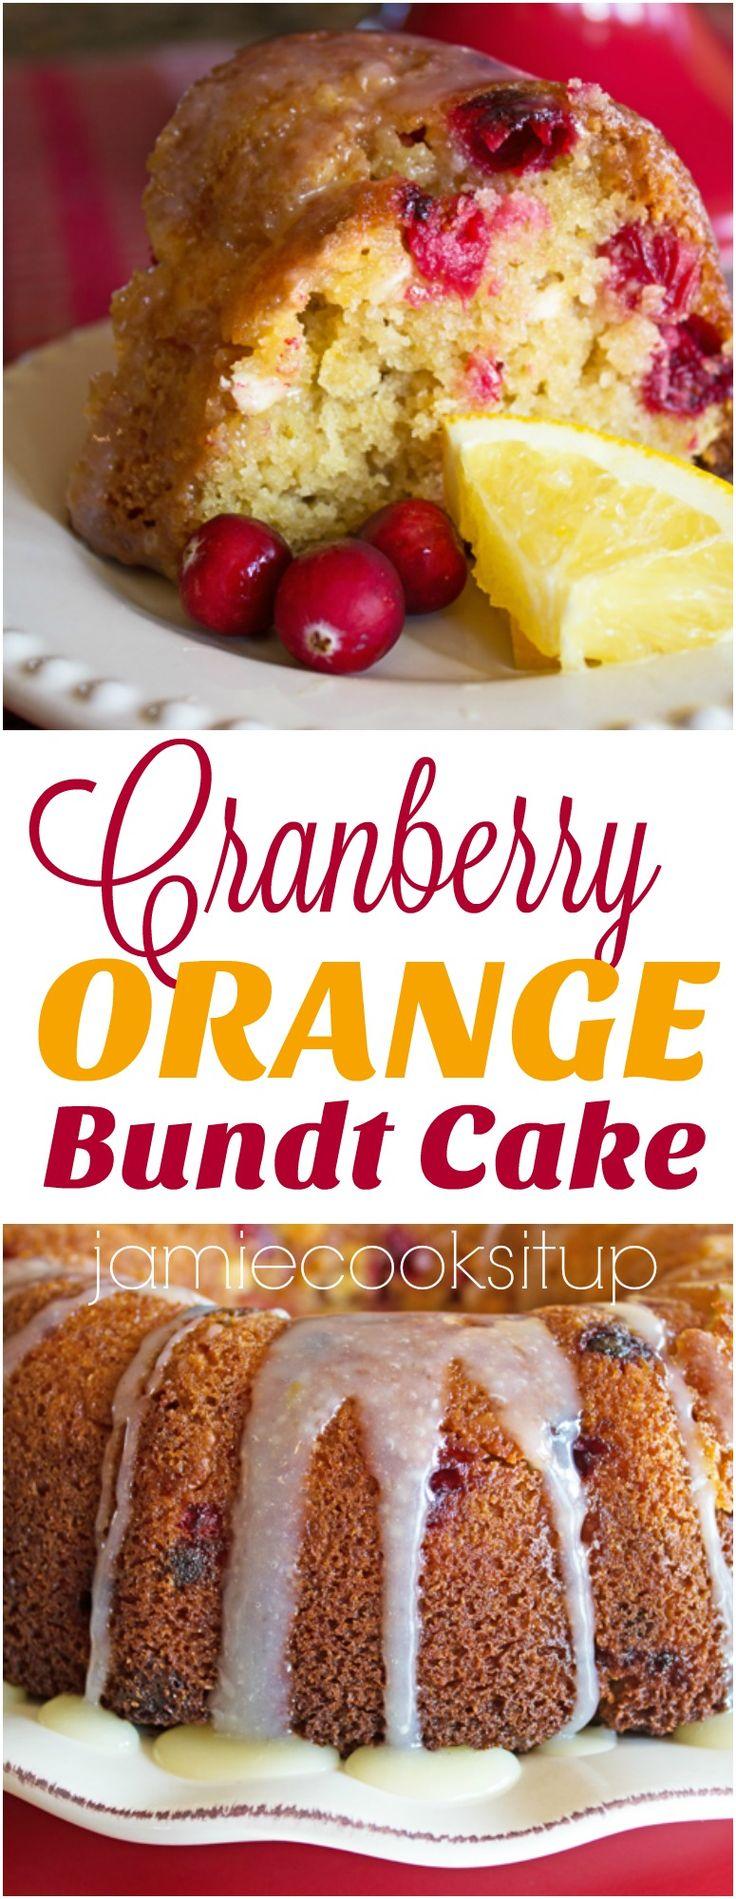 Cranberry Orange Bundt Cake from Jamie Cooks It Up!